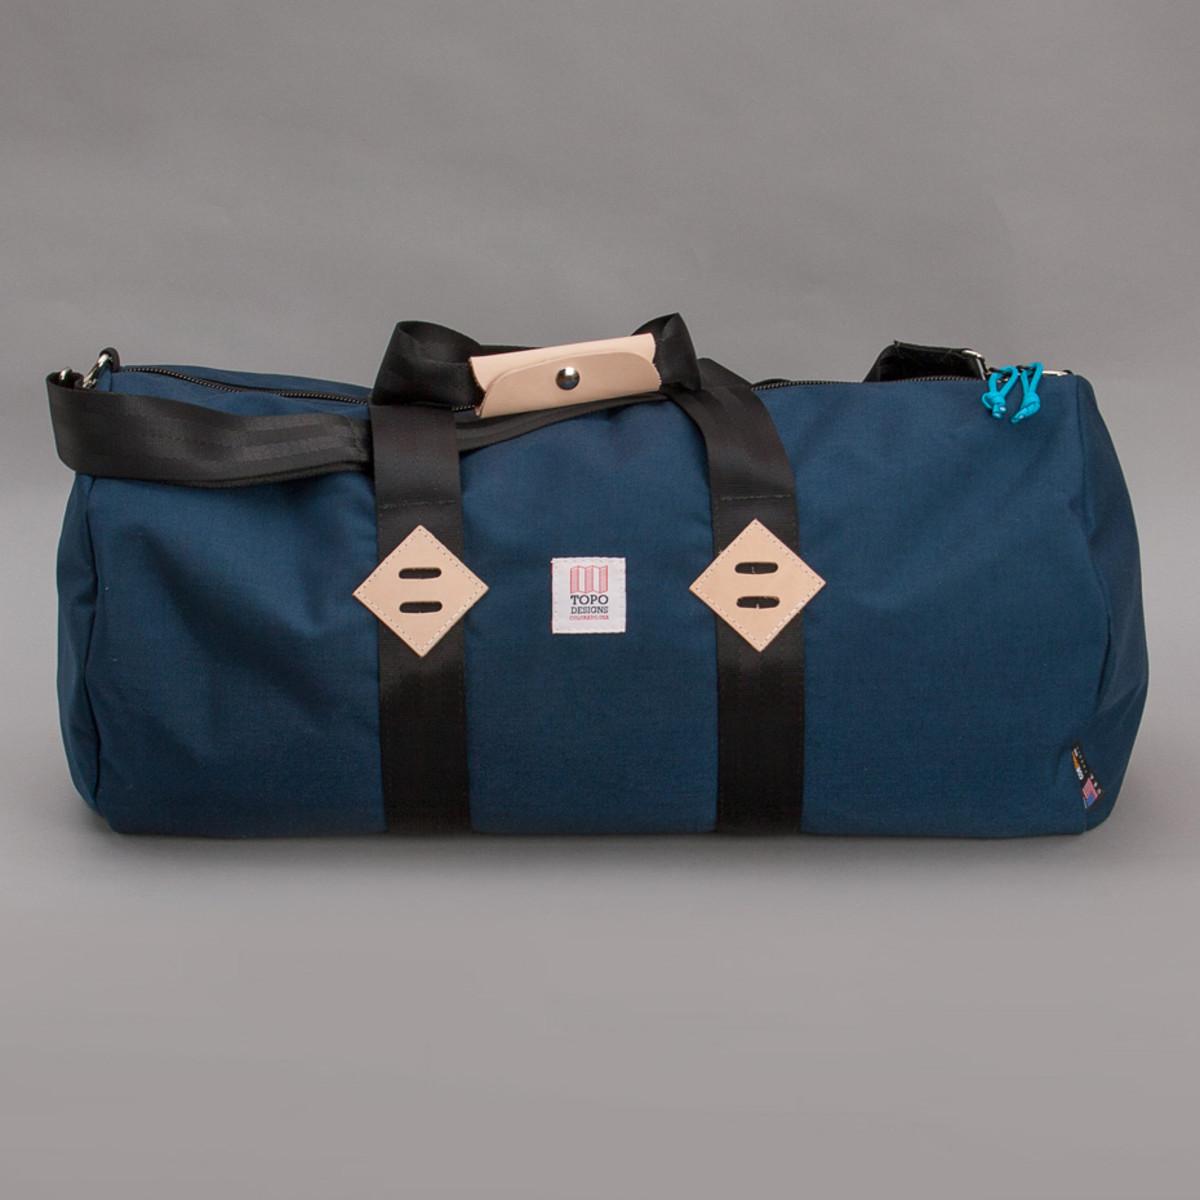 topo-designs-duffel-bag-navy